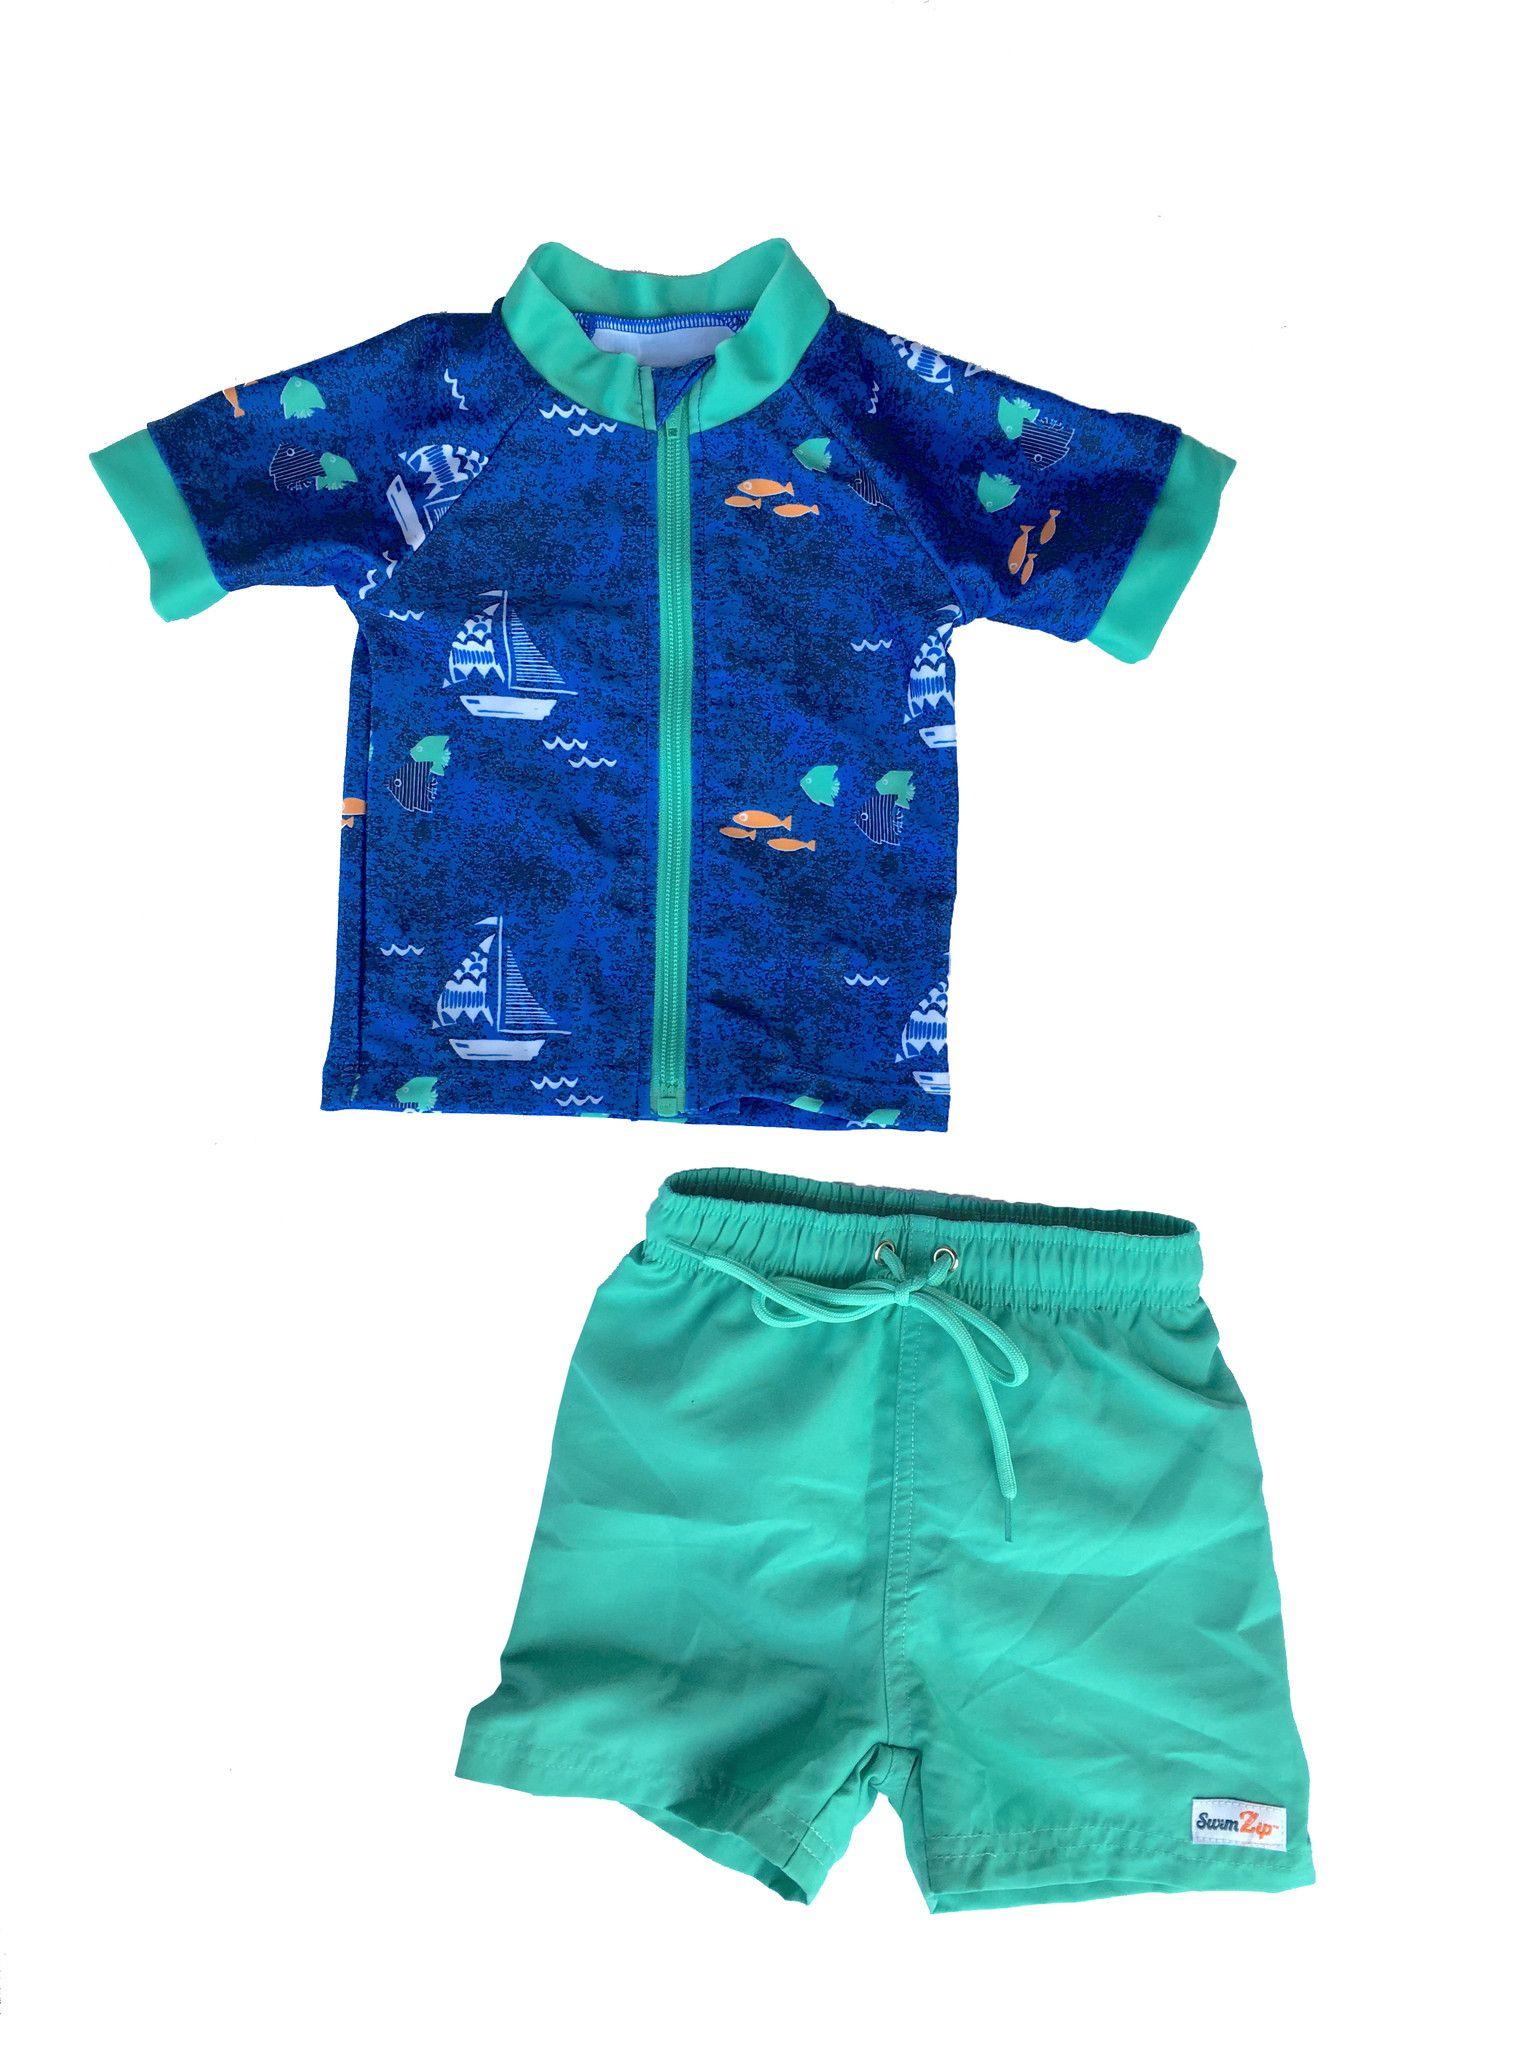 Shop Early Captain Kid Short Sleeve Rash Guard Swimsuit Set 2